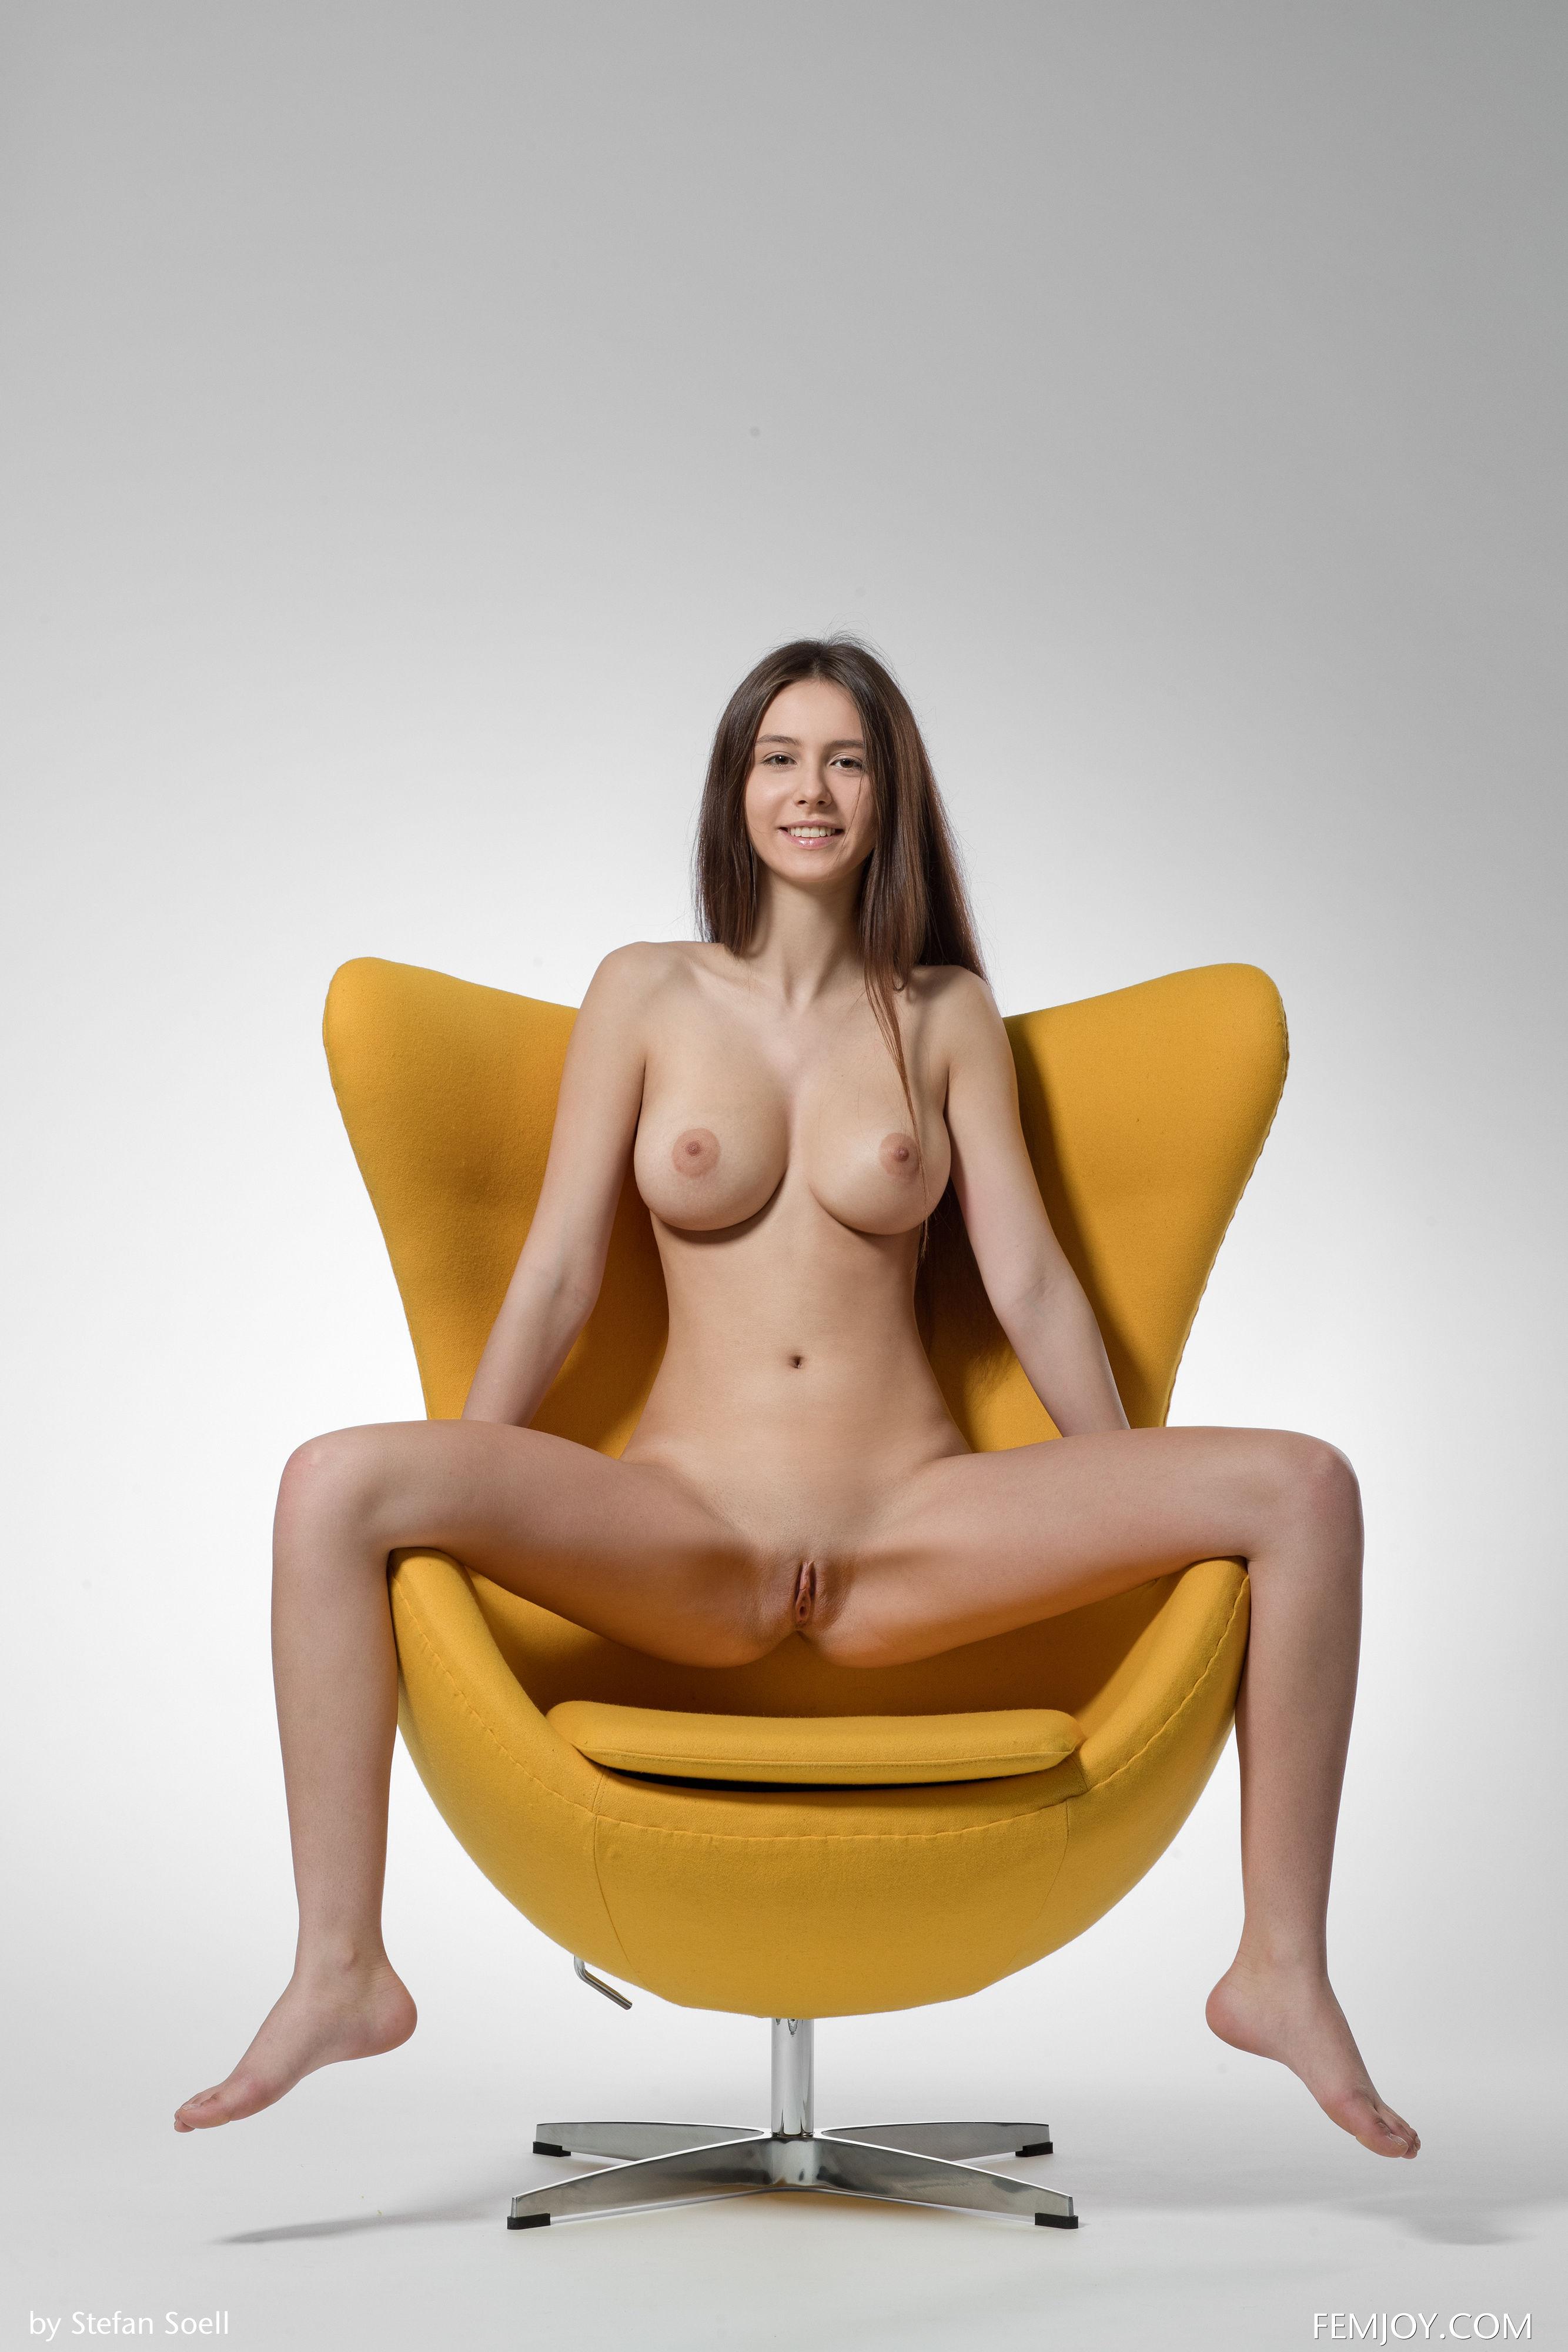 76857693_alisai_femjoy_stefansoell_yellow_19052018p_33.jpg